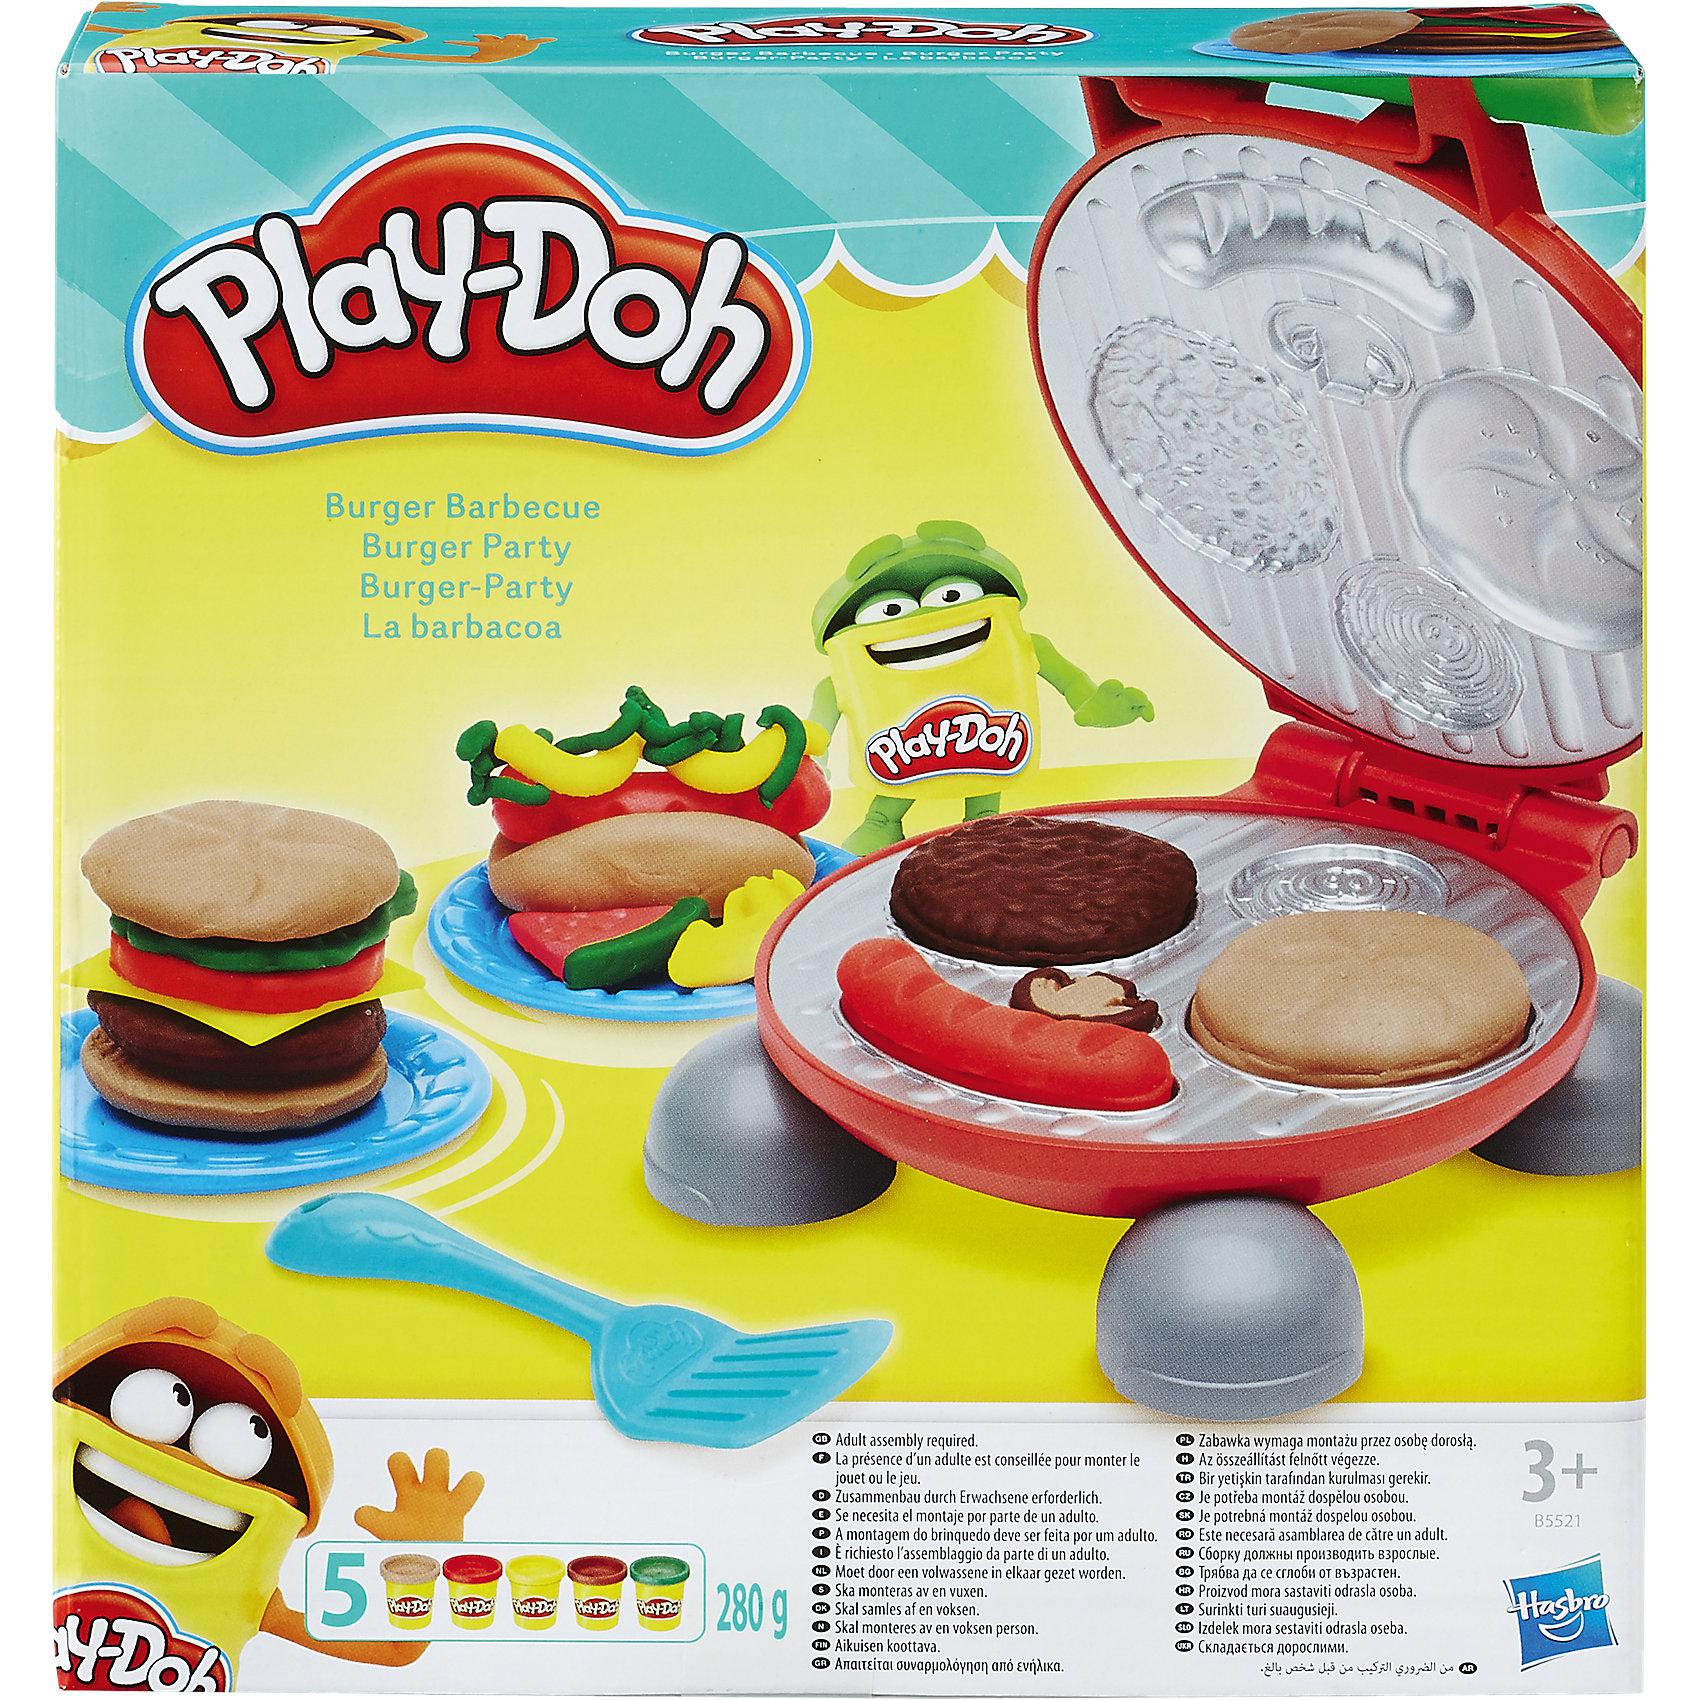 Hasbro Игровой набор Бургер гриль, Play-Doh hasbro play doh b5868 игровой набор главная улица